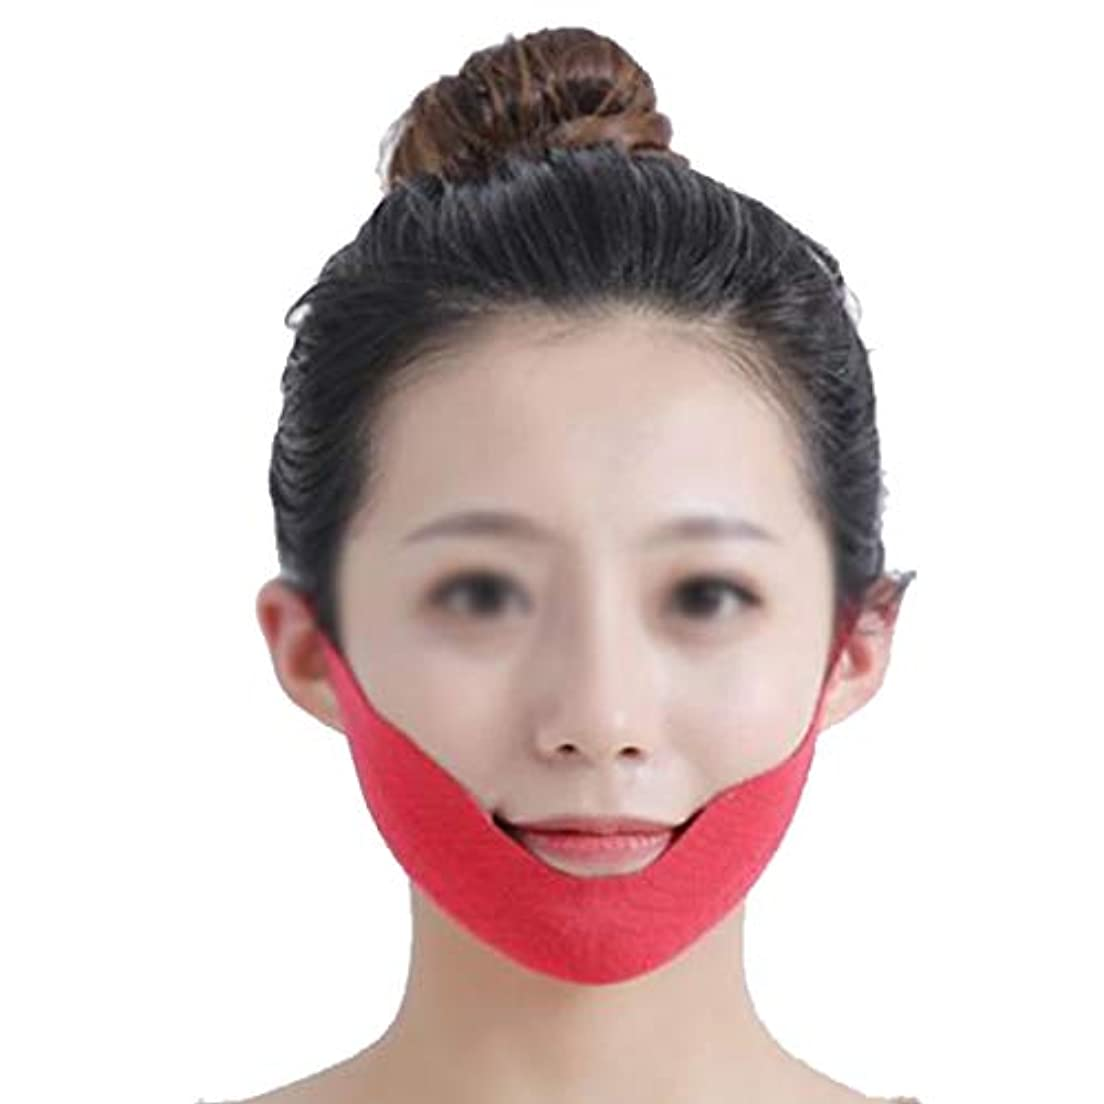 ZWBD フェイスマスク, 薄いフェイスマスク小さなVフェイスマスクリフティングイヤーストラップ包帯アーティファクトペーストハイドロゲル